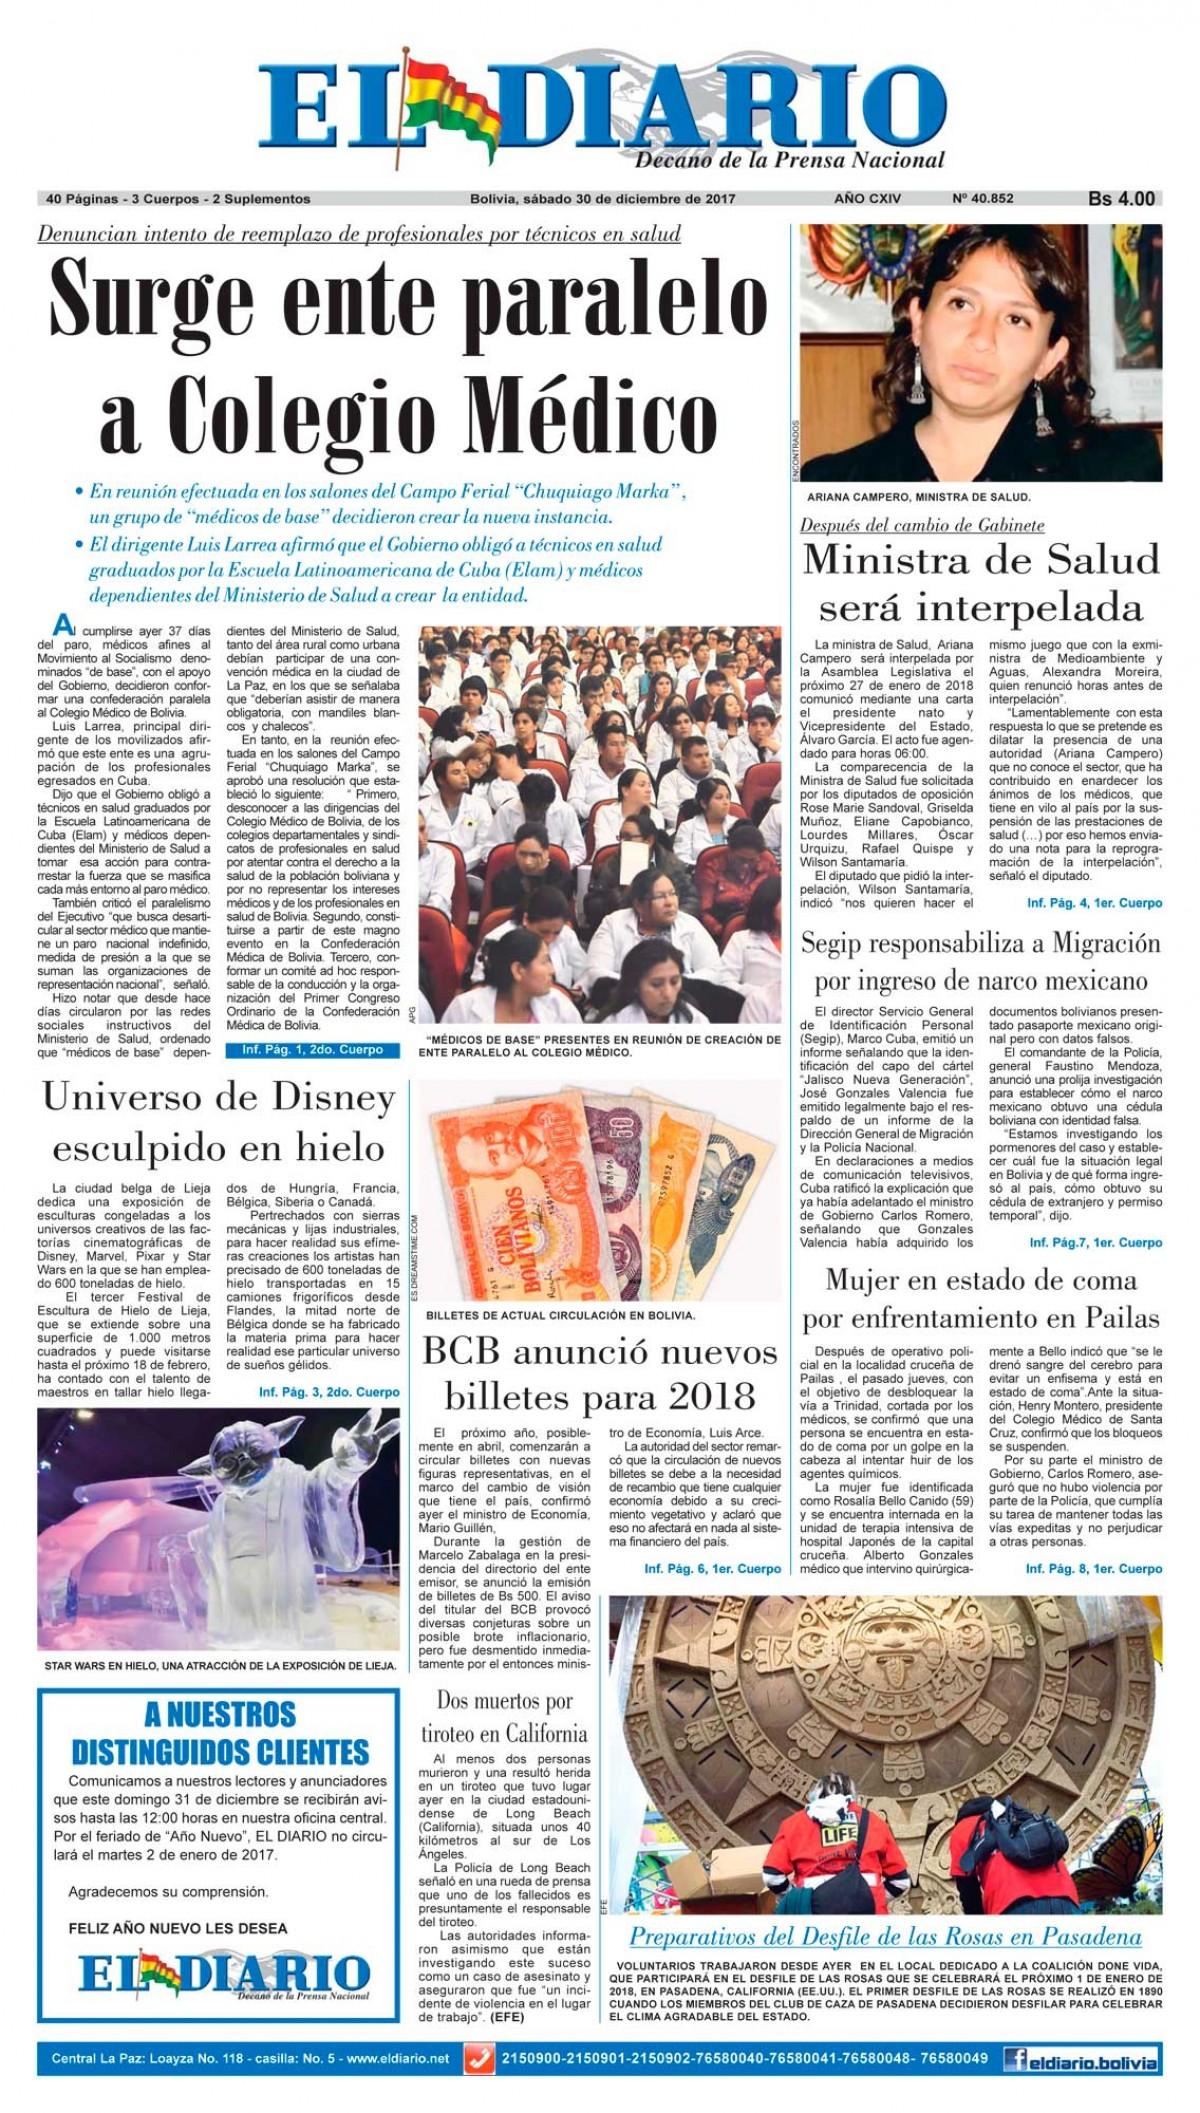 eldiario.net5a477c58095ce.jpg